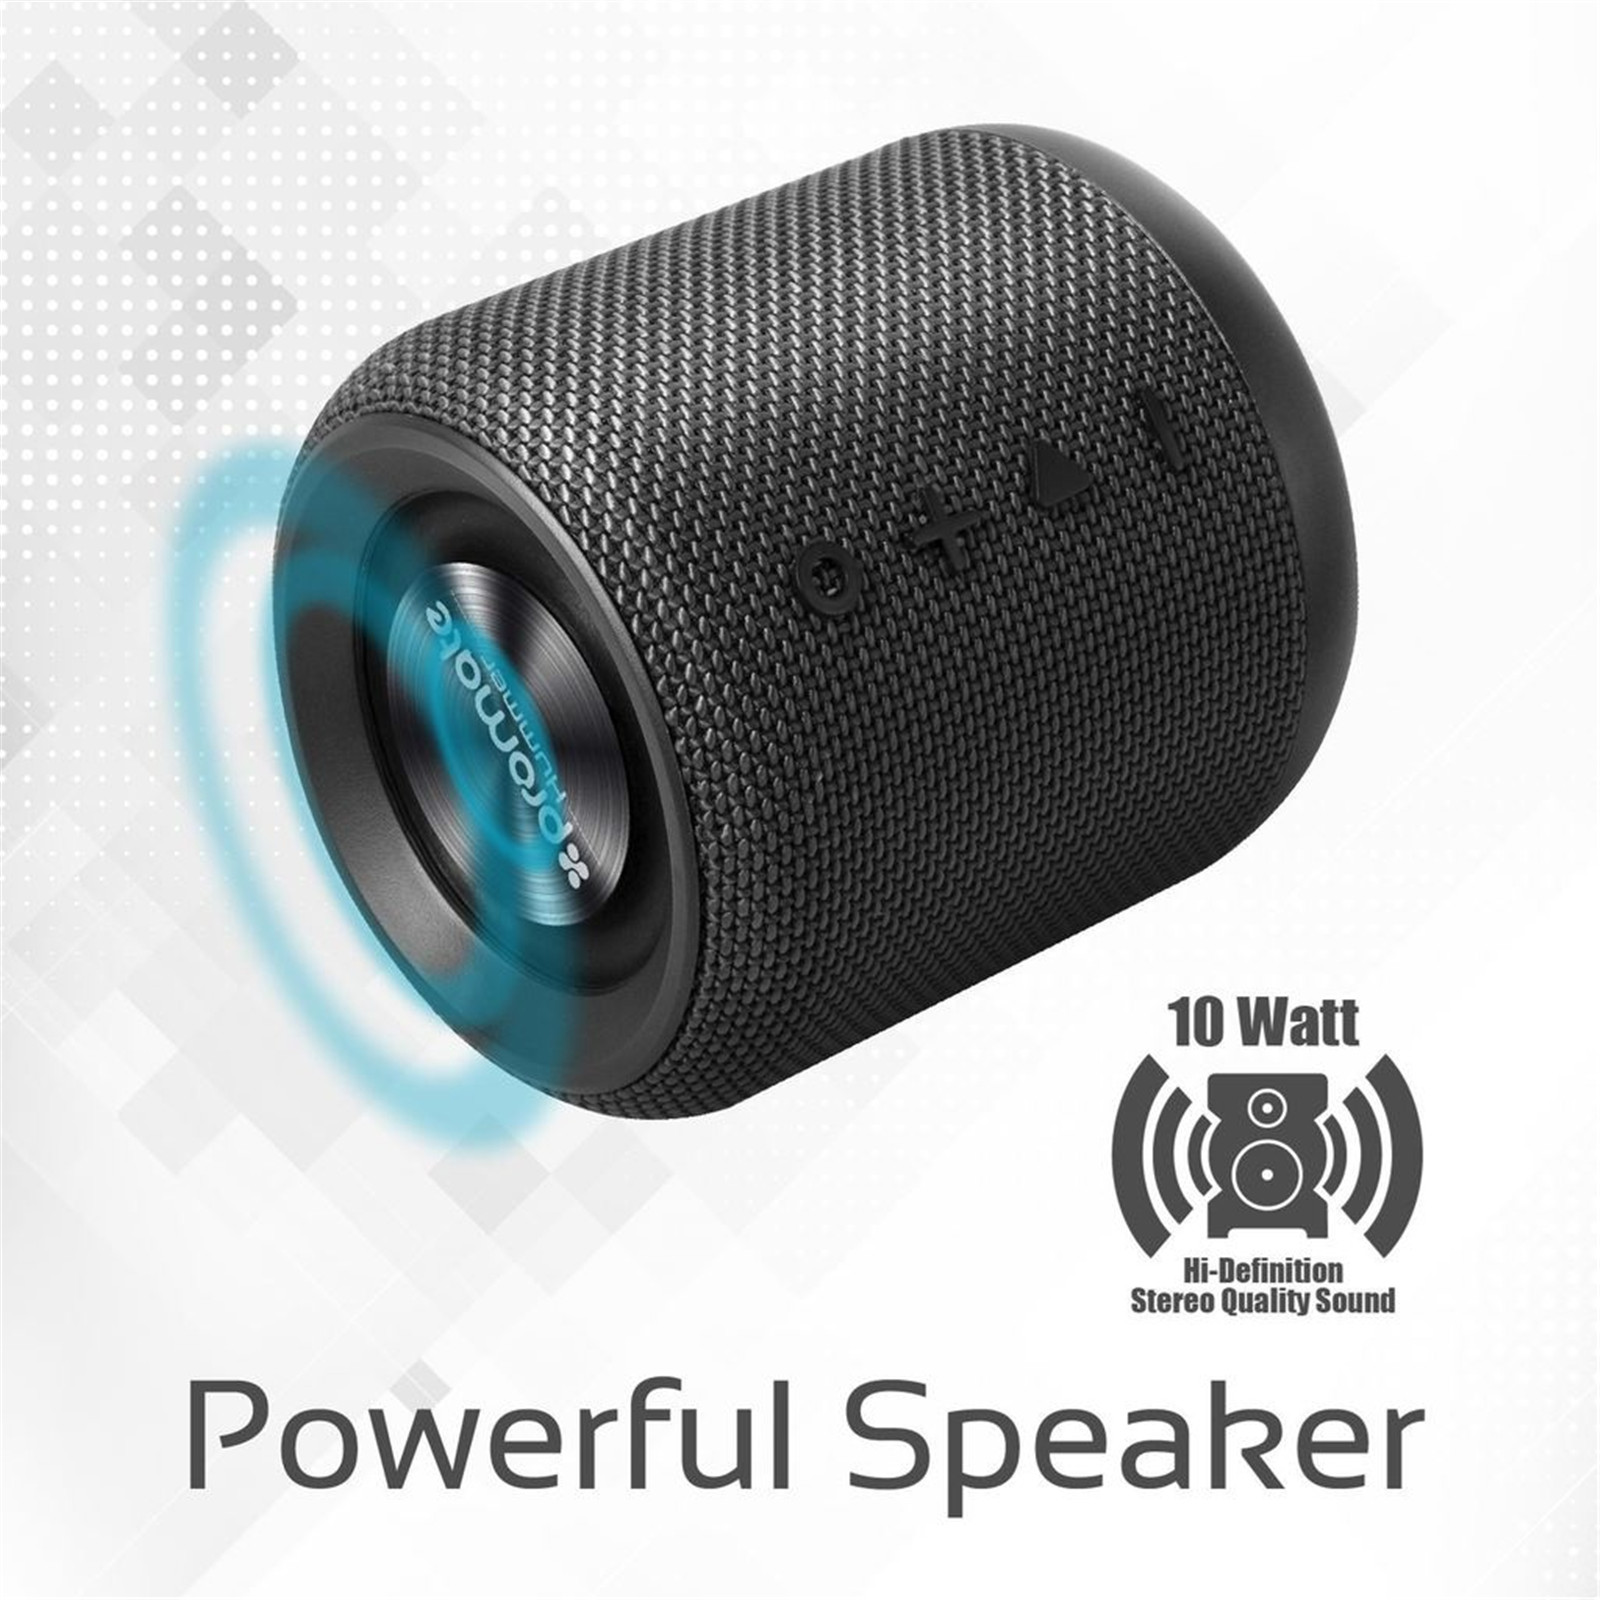 Buy the Promate HUMMER BLK 10W Wireless Bluetooth Speaker